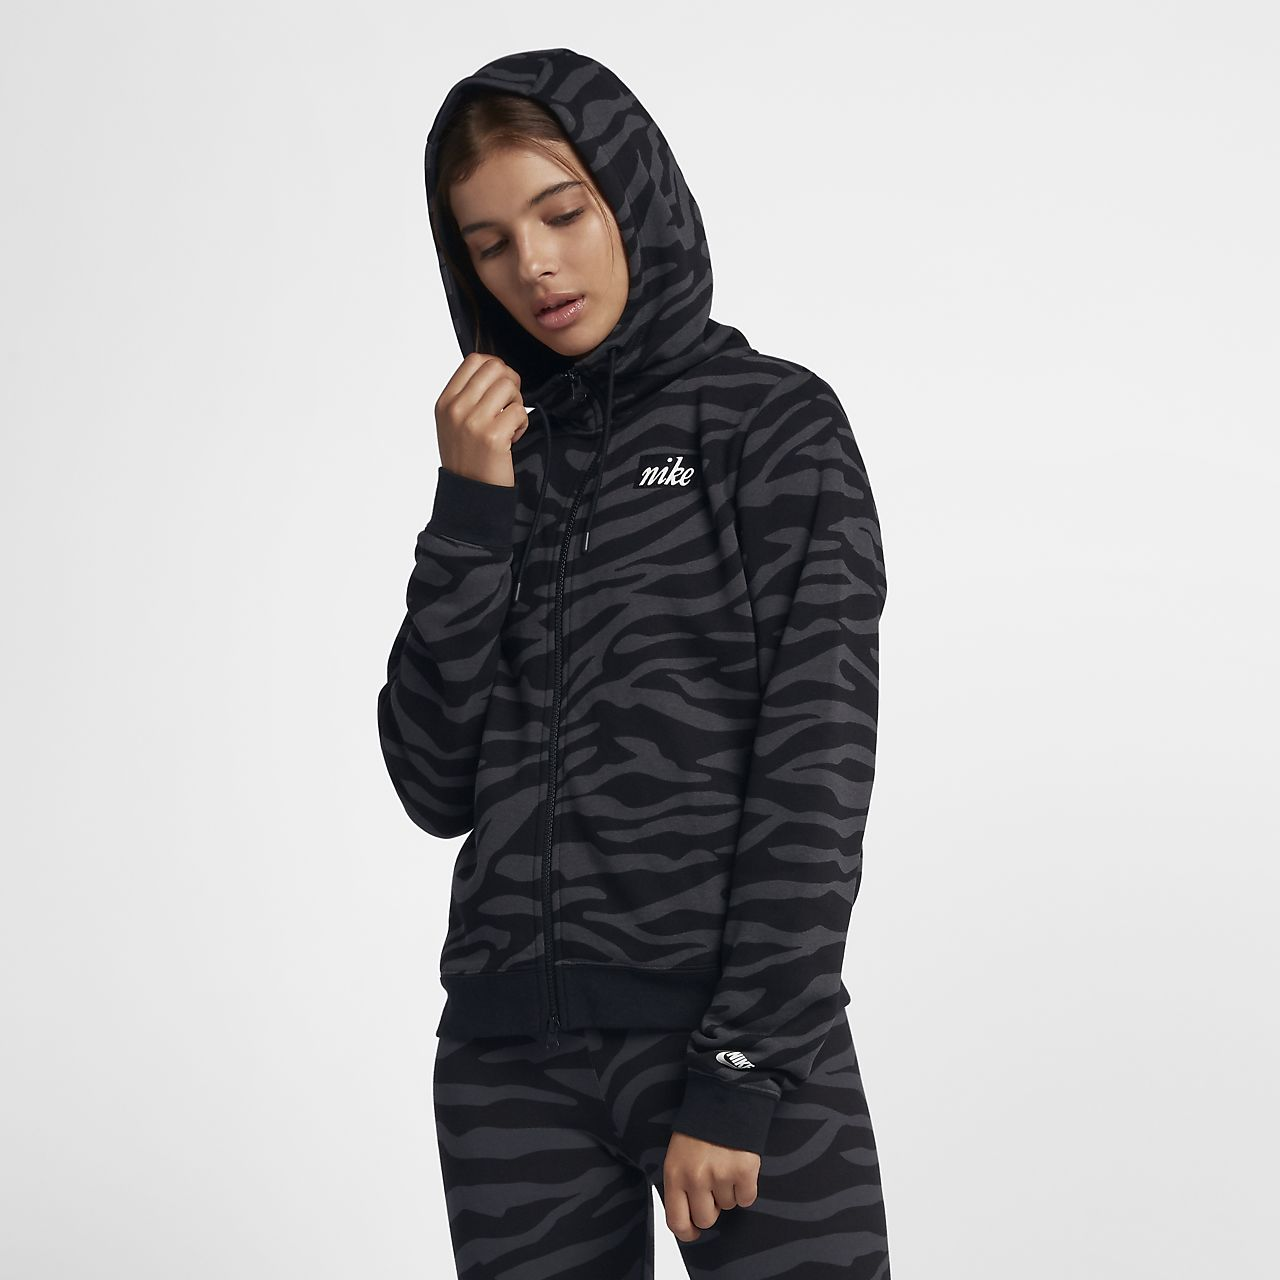 Nike Sportswear Women's Full-Zip Animal Hoodie